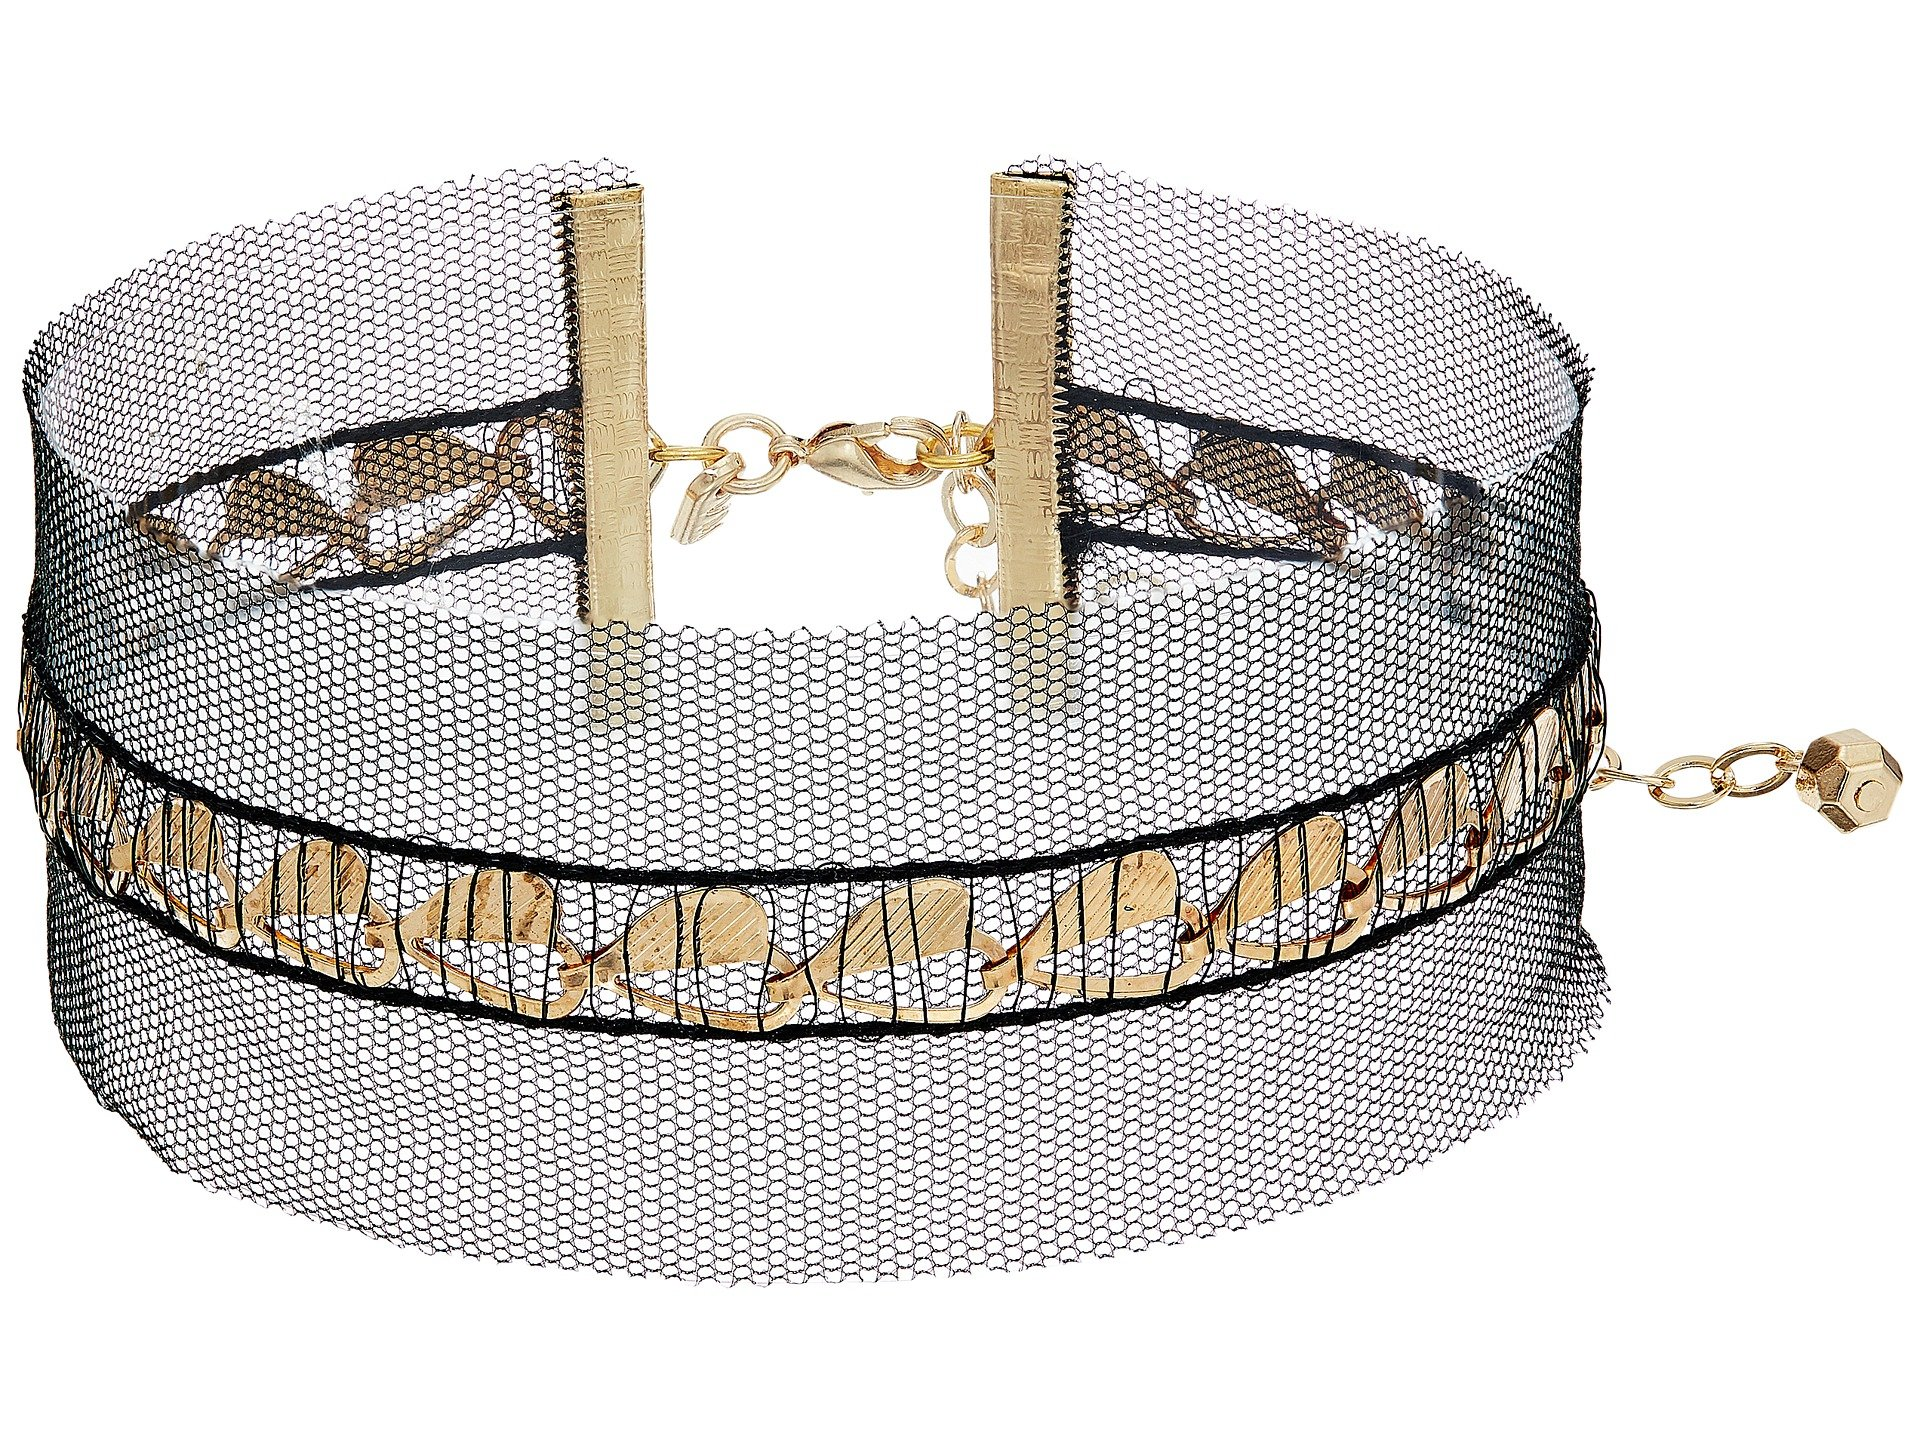 The Bambi Choker Necklace